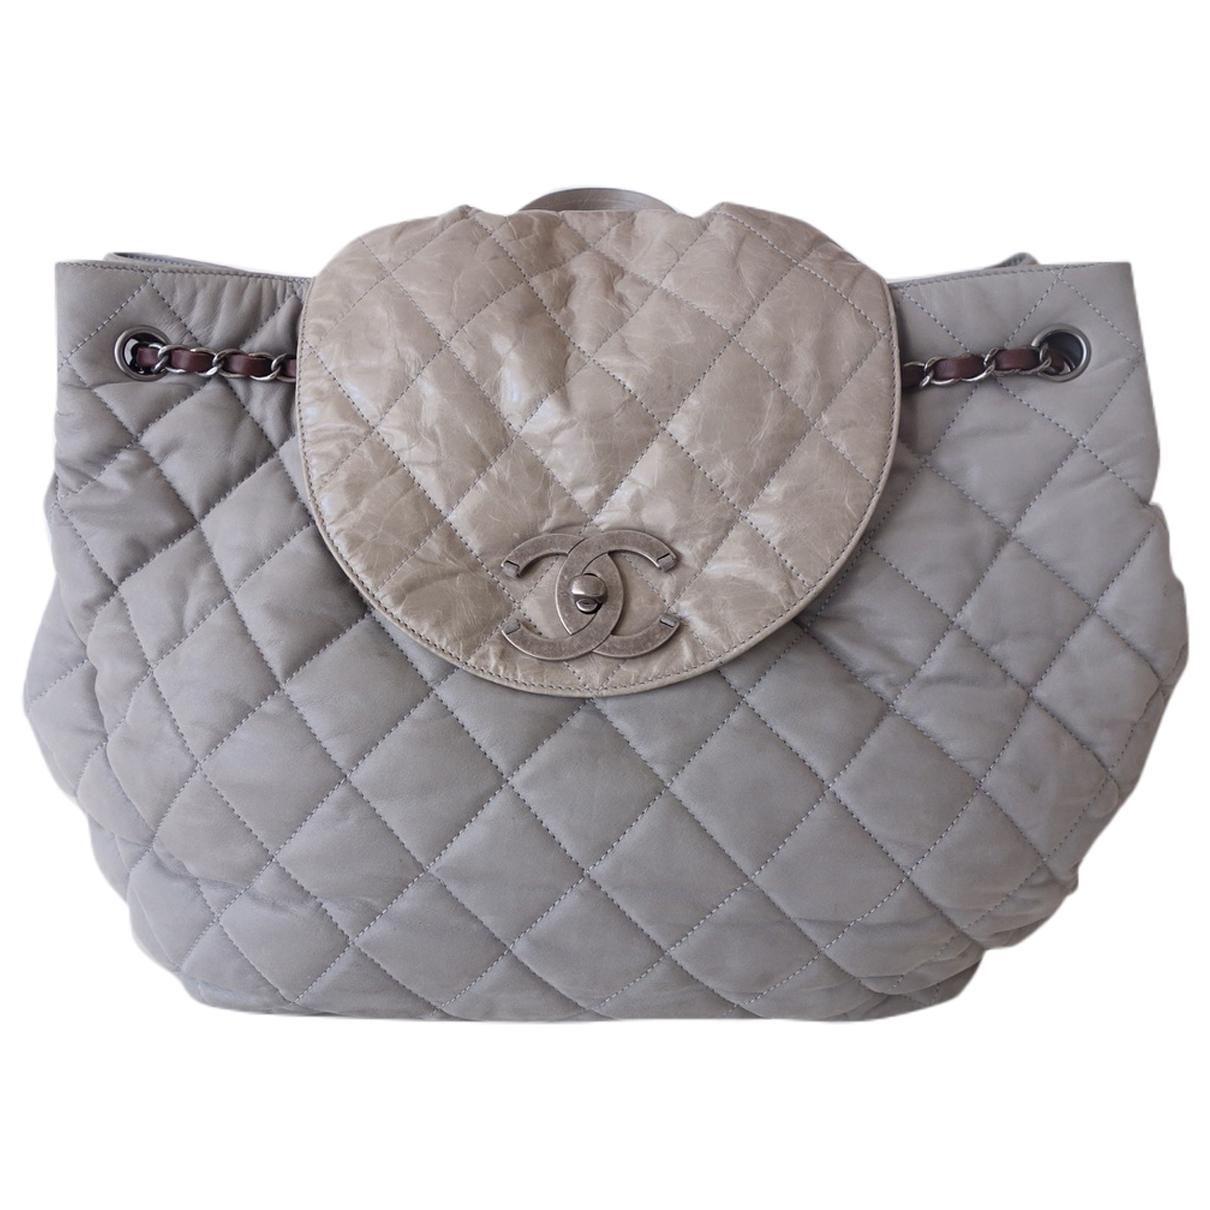 Chanel \N Rucksaecke in  Grau Leder